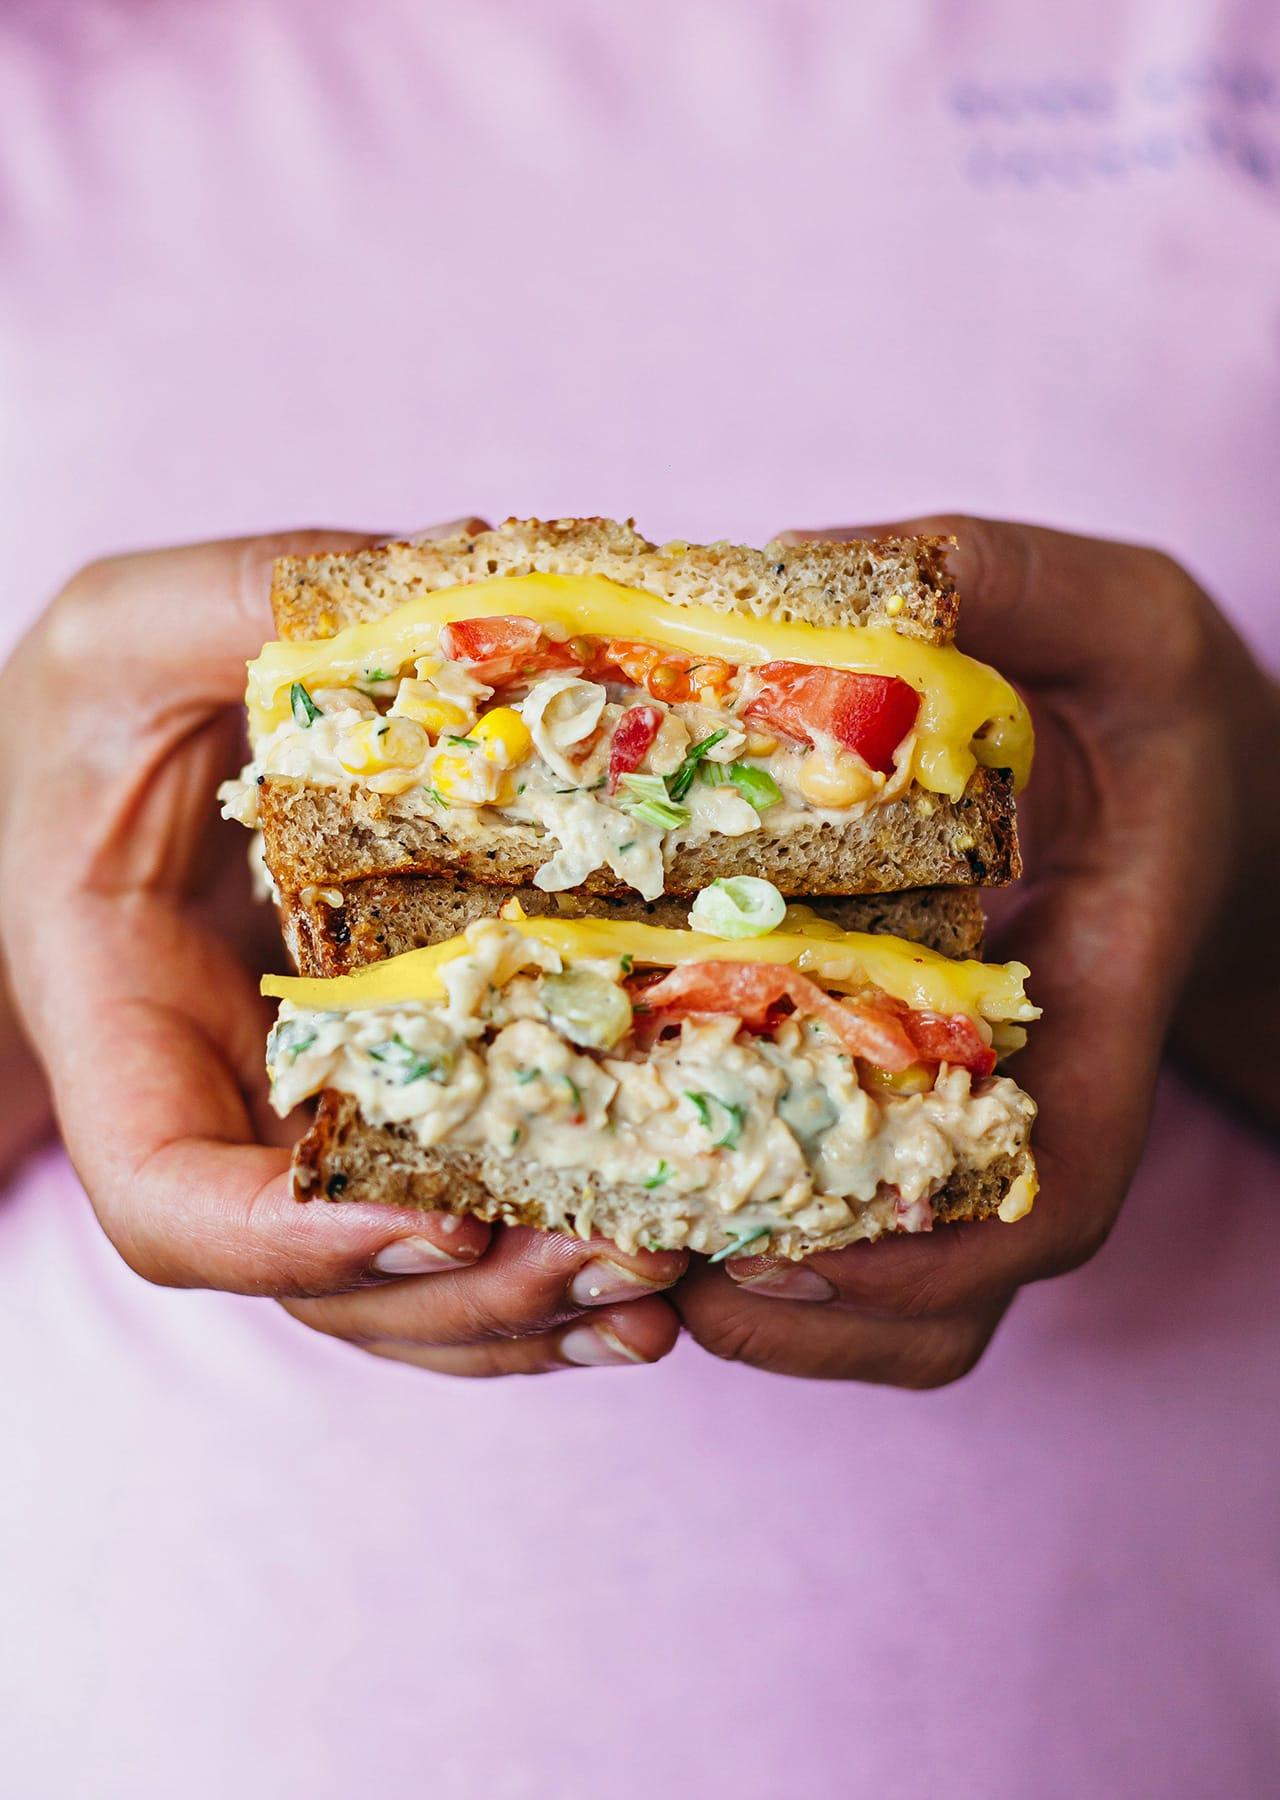 Vegan Chickpea Tuna Cheese Melt Sandwich Recipe